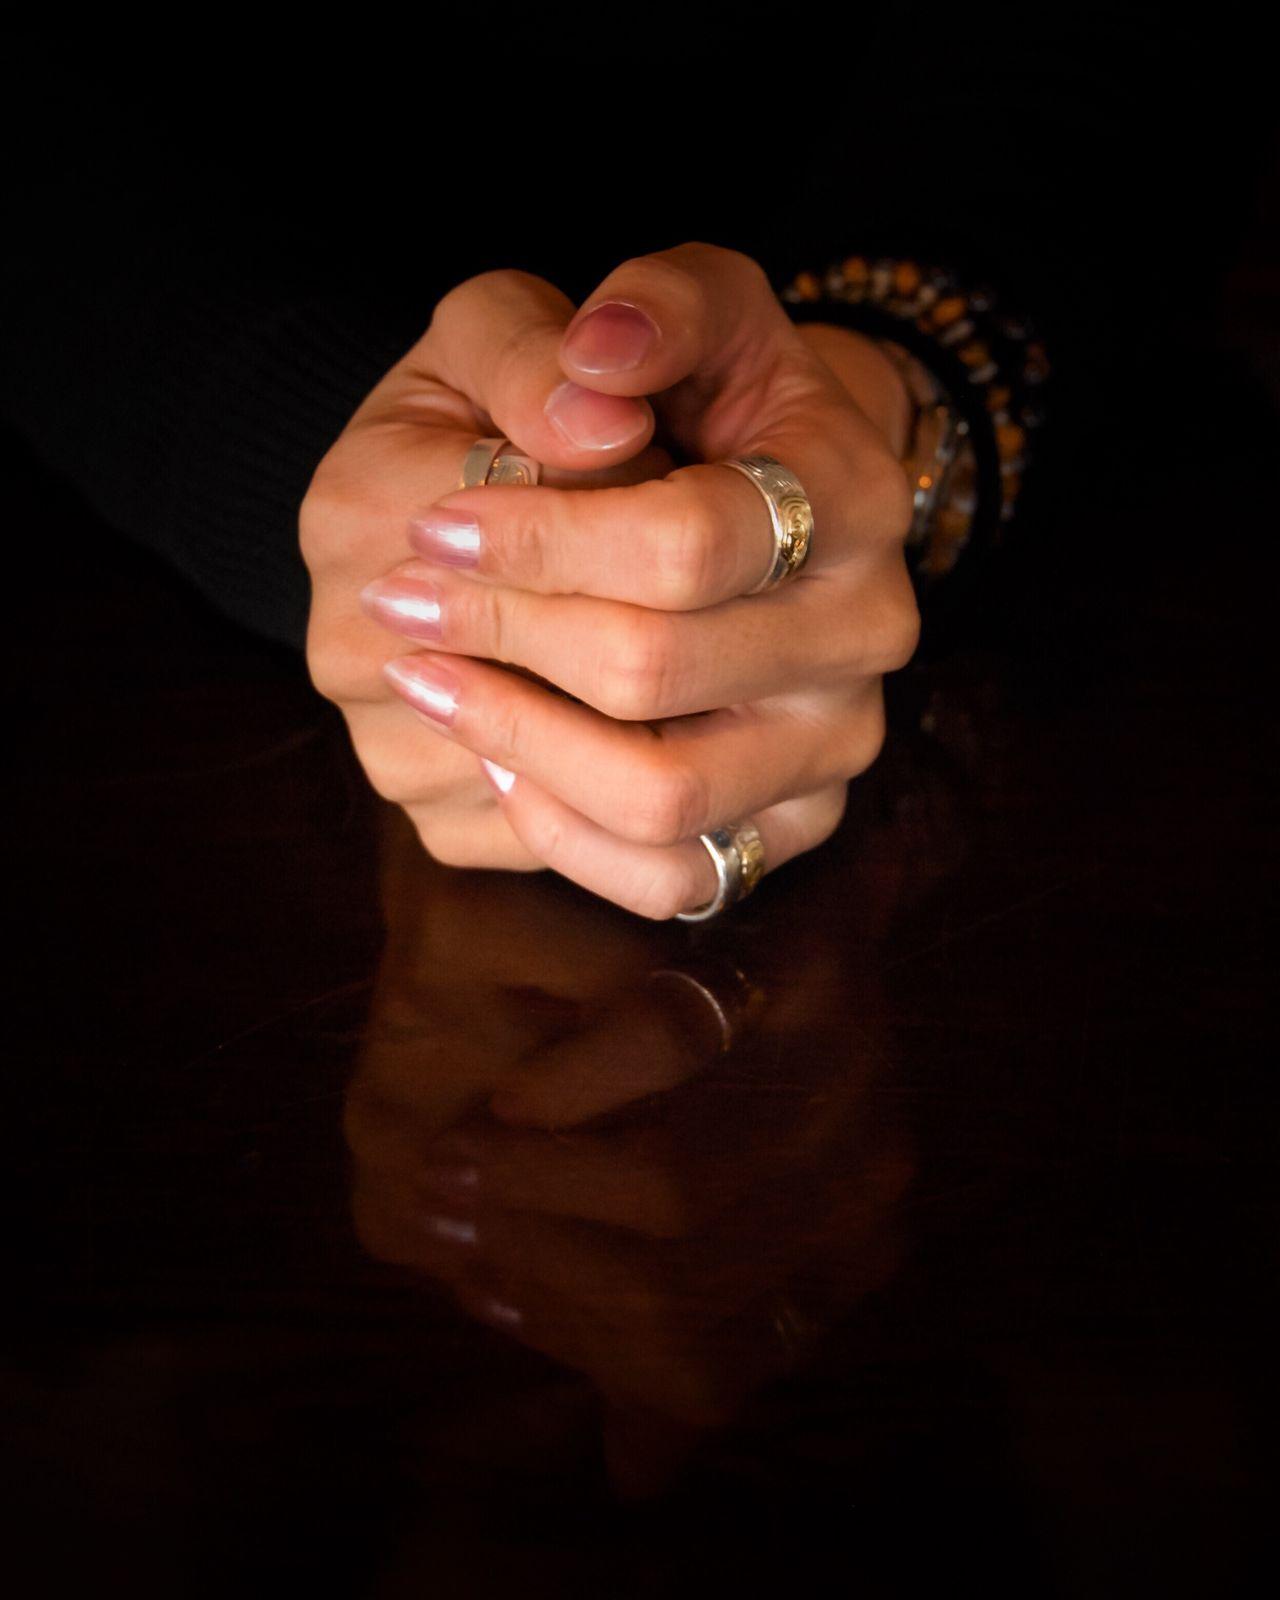 Human Hand Hand Fingers Fingernail Ring Reflection